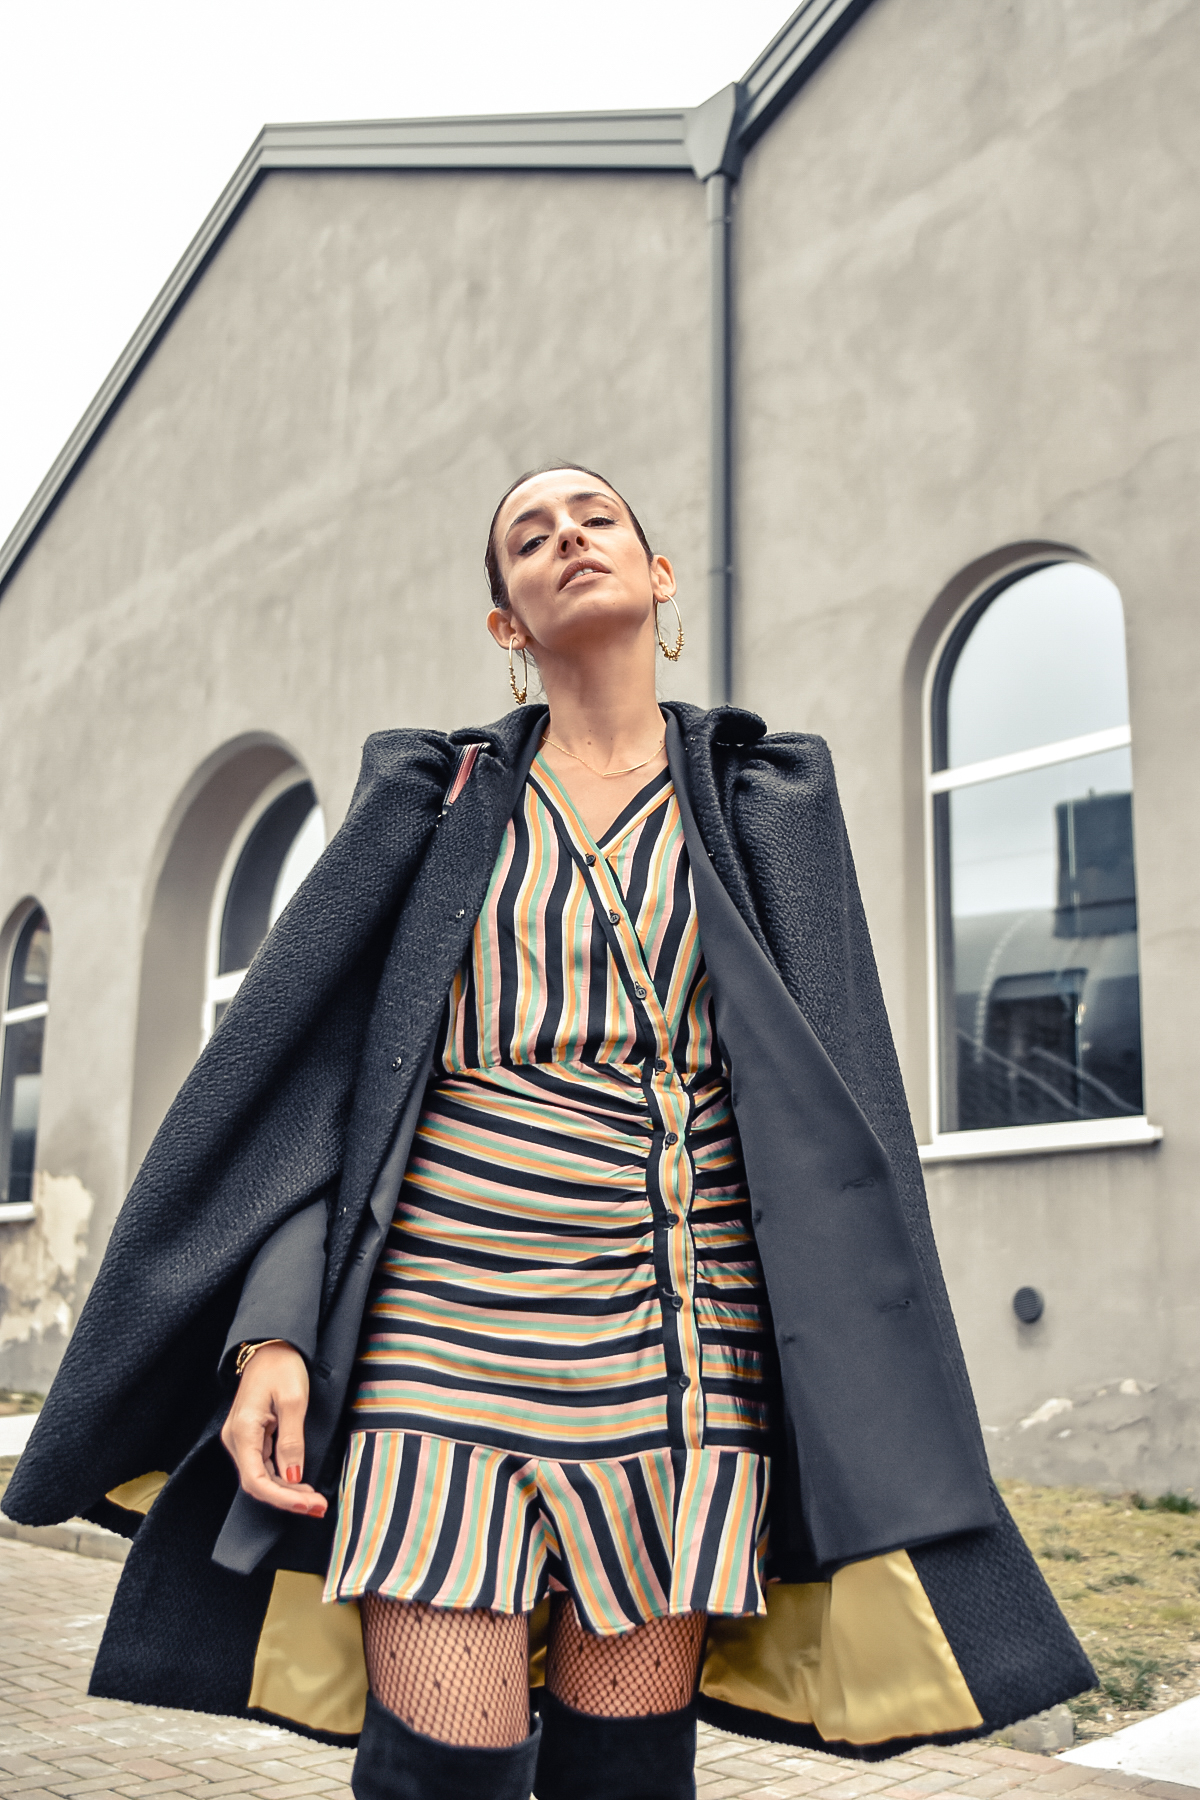 el-blog-de-silvia-fashion-blogger-street-style-mfw-vestido-rayas-04